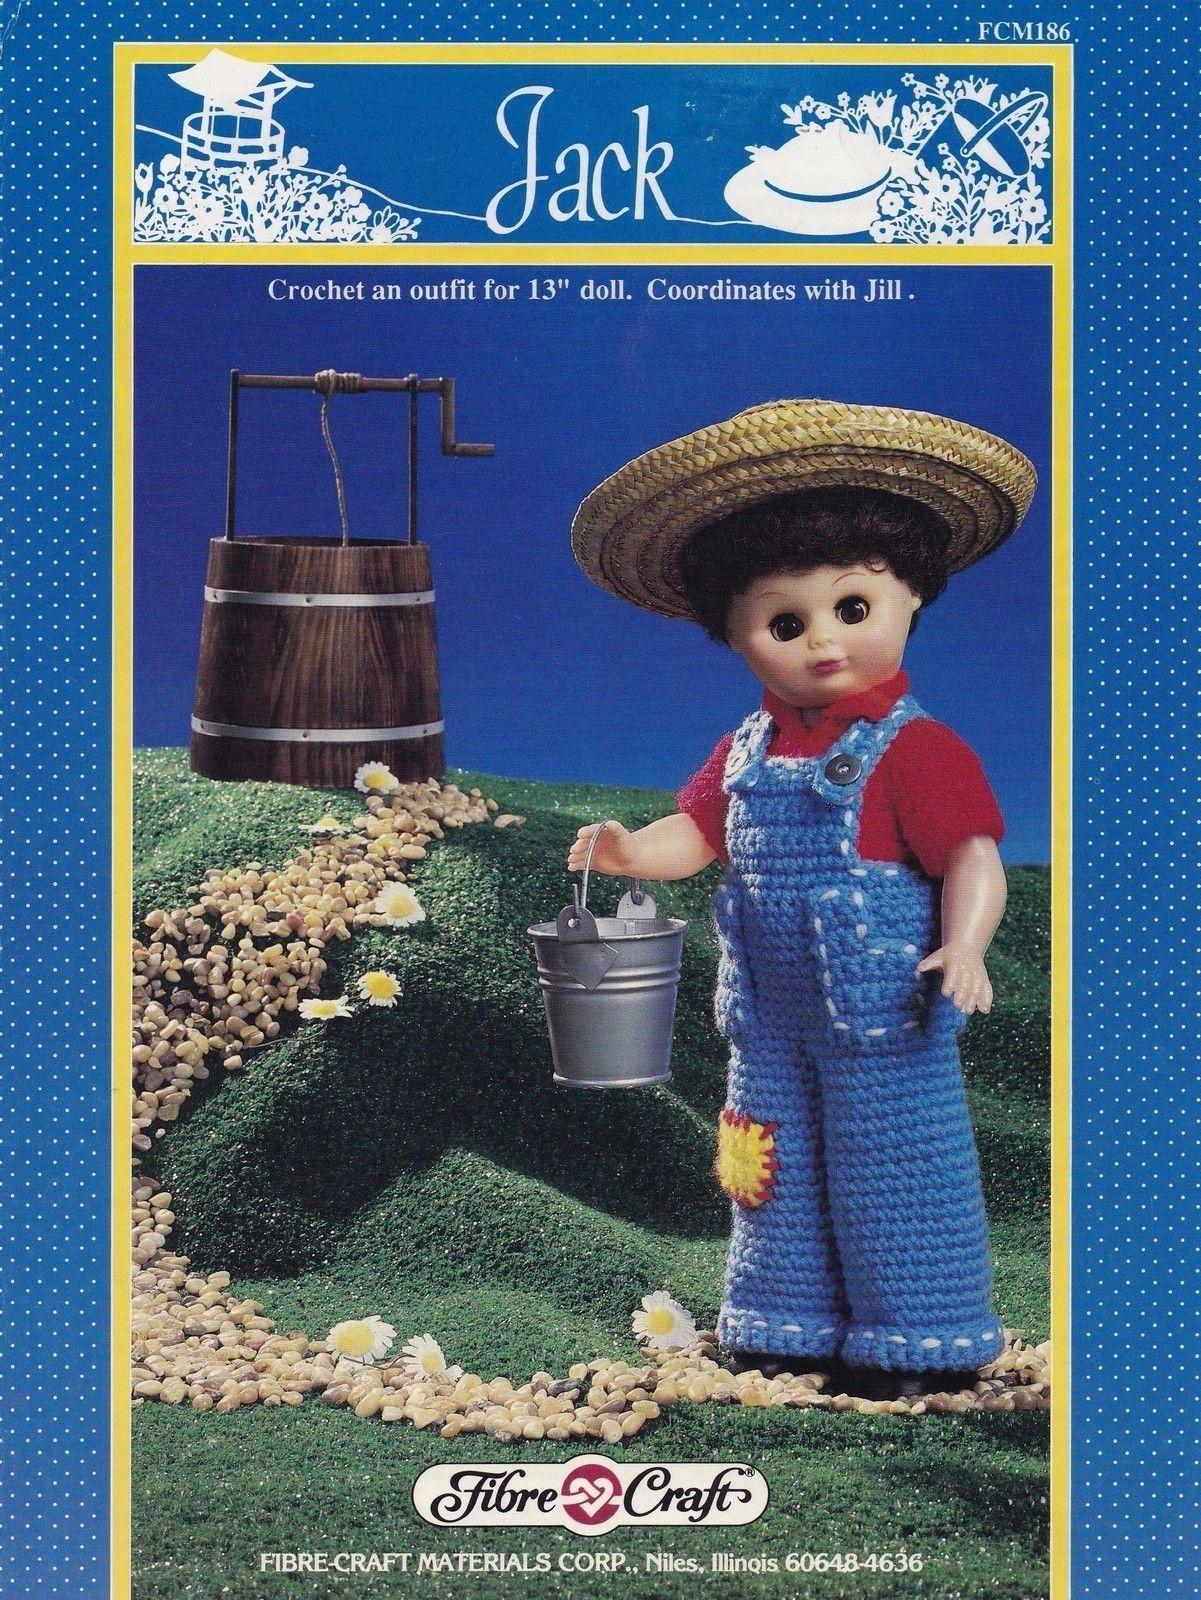 Jack, Fibre Craft 13 inch Male Doll Clothes Crochet Pattern Booklet FCM186